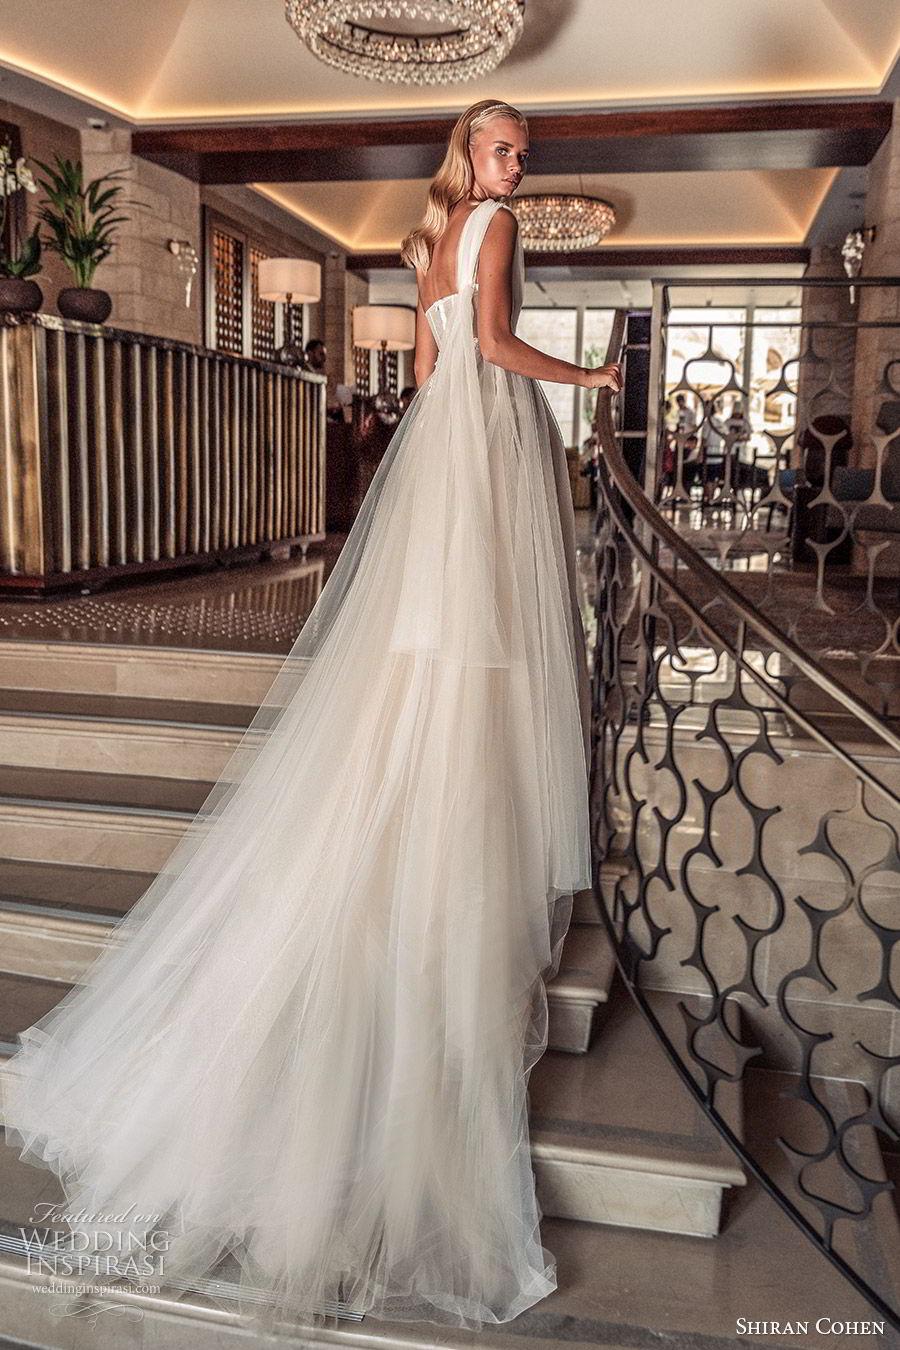 shiran cohen 2019 bridal one shoulder strap straight across embellished bodice a line ball gown wedding dress chapel train romantic elegant (11) bv